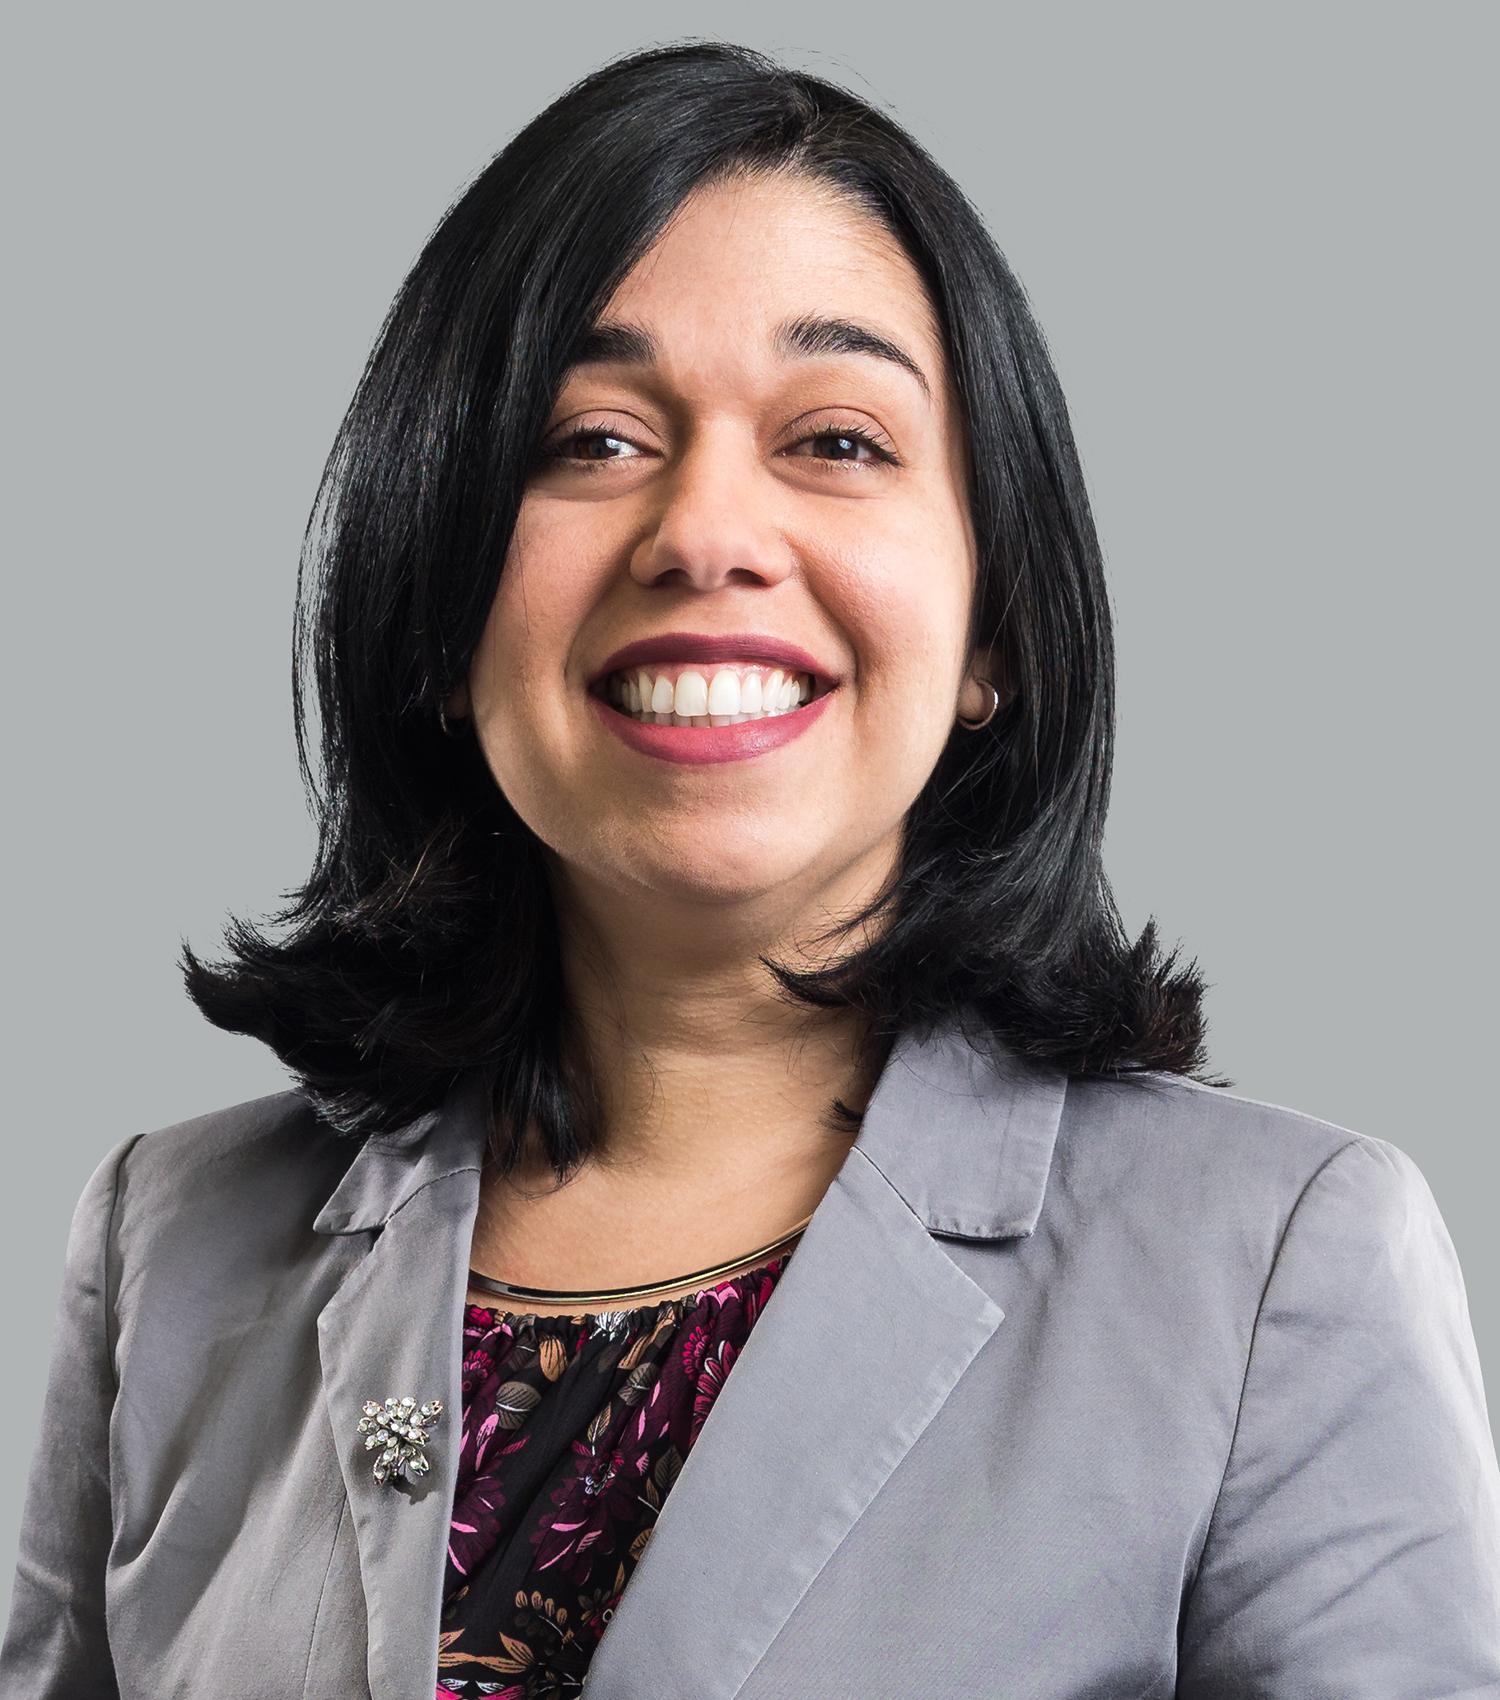 Natali Fani-Gonzalez, Commissioner